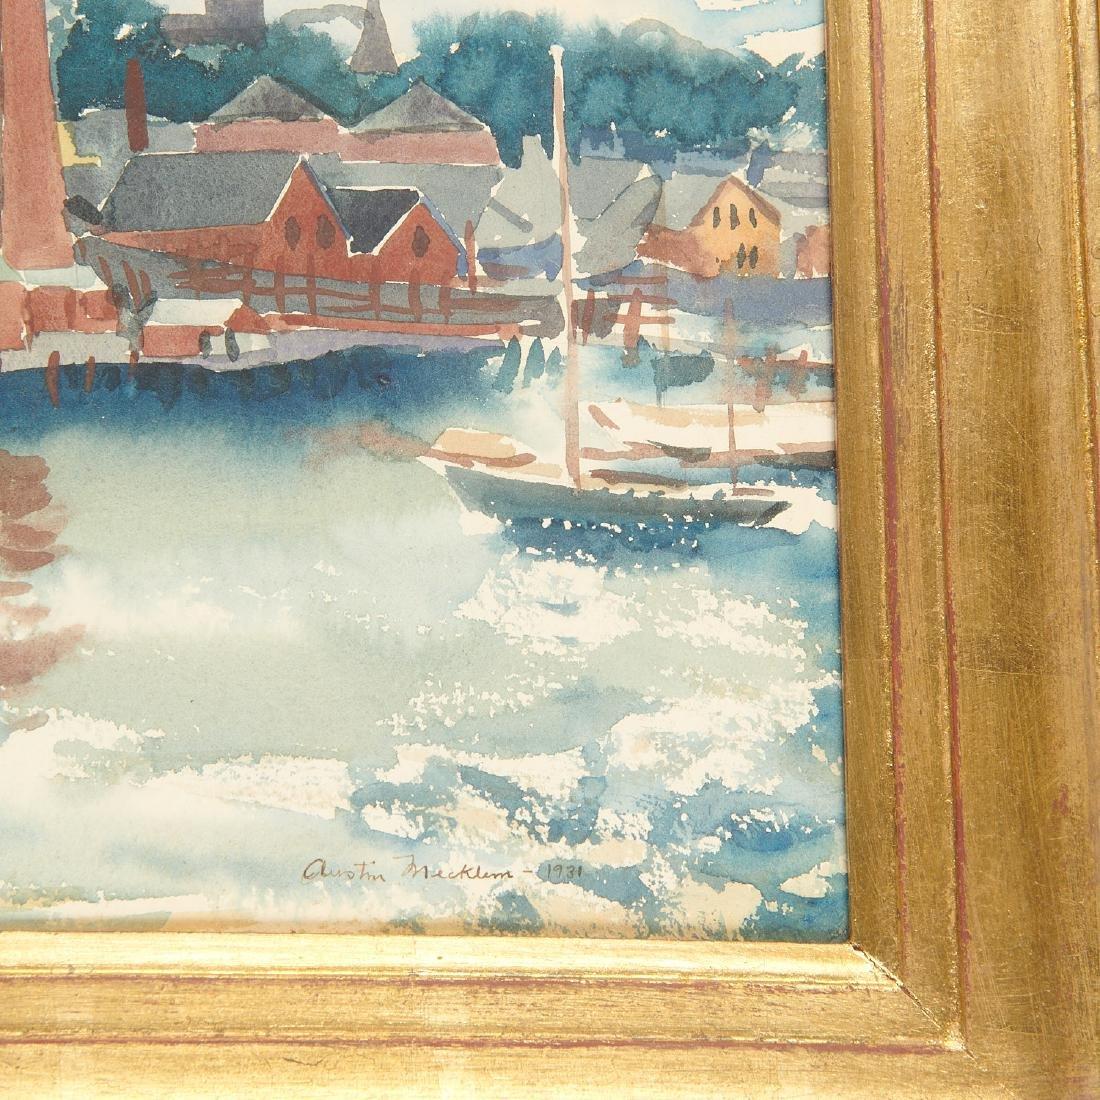 Austin Mecklem, painting, 1931 - 5